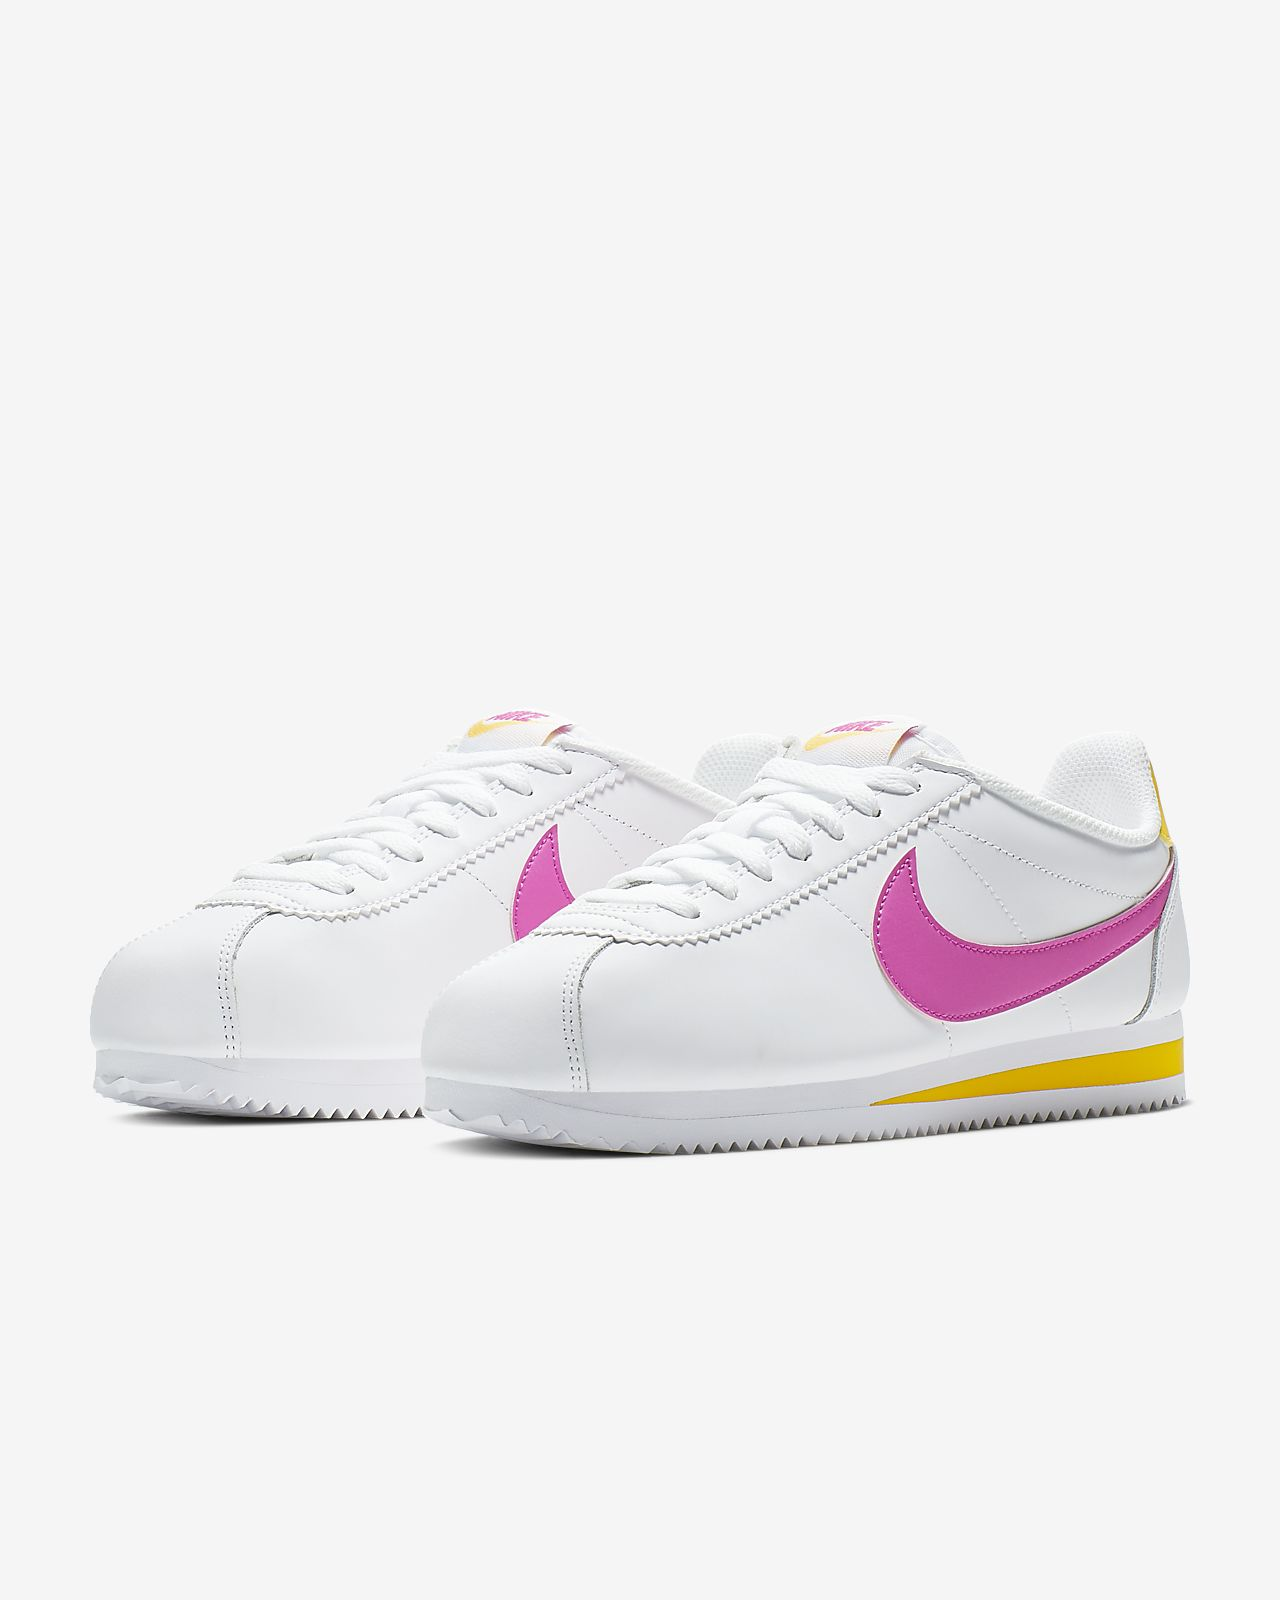 the latest ae18f 561d6 ... Sko Nike Classic Cortez för kvinnor